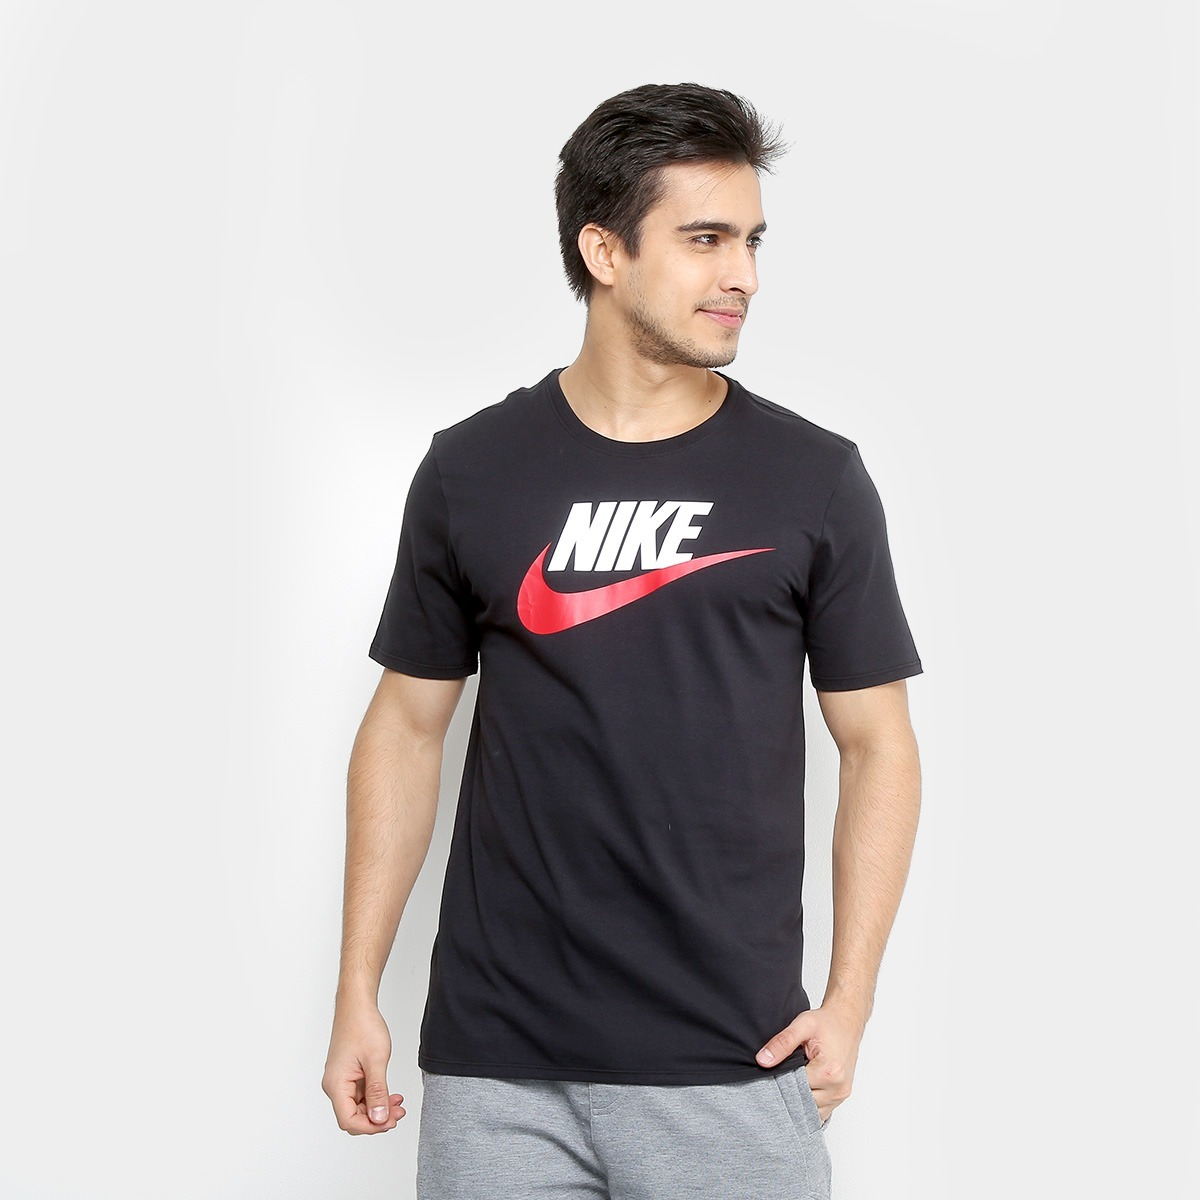 97b9c4b107 camiseta nike futura icon - preto e cinza. Carregando zoom.